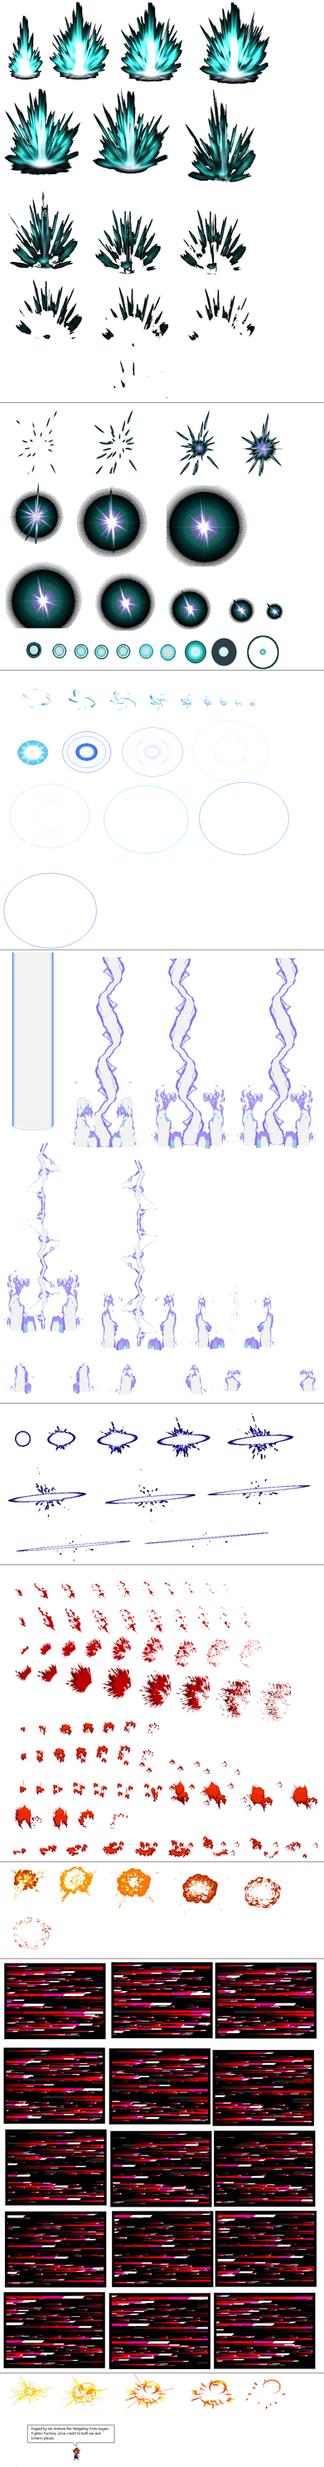 Ultimate Effects Sheet 2 by Xypter